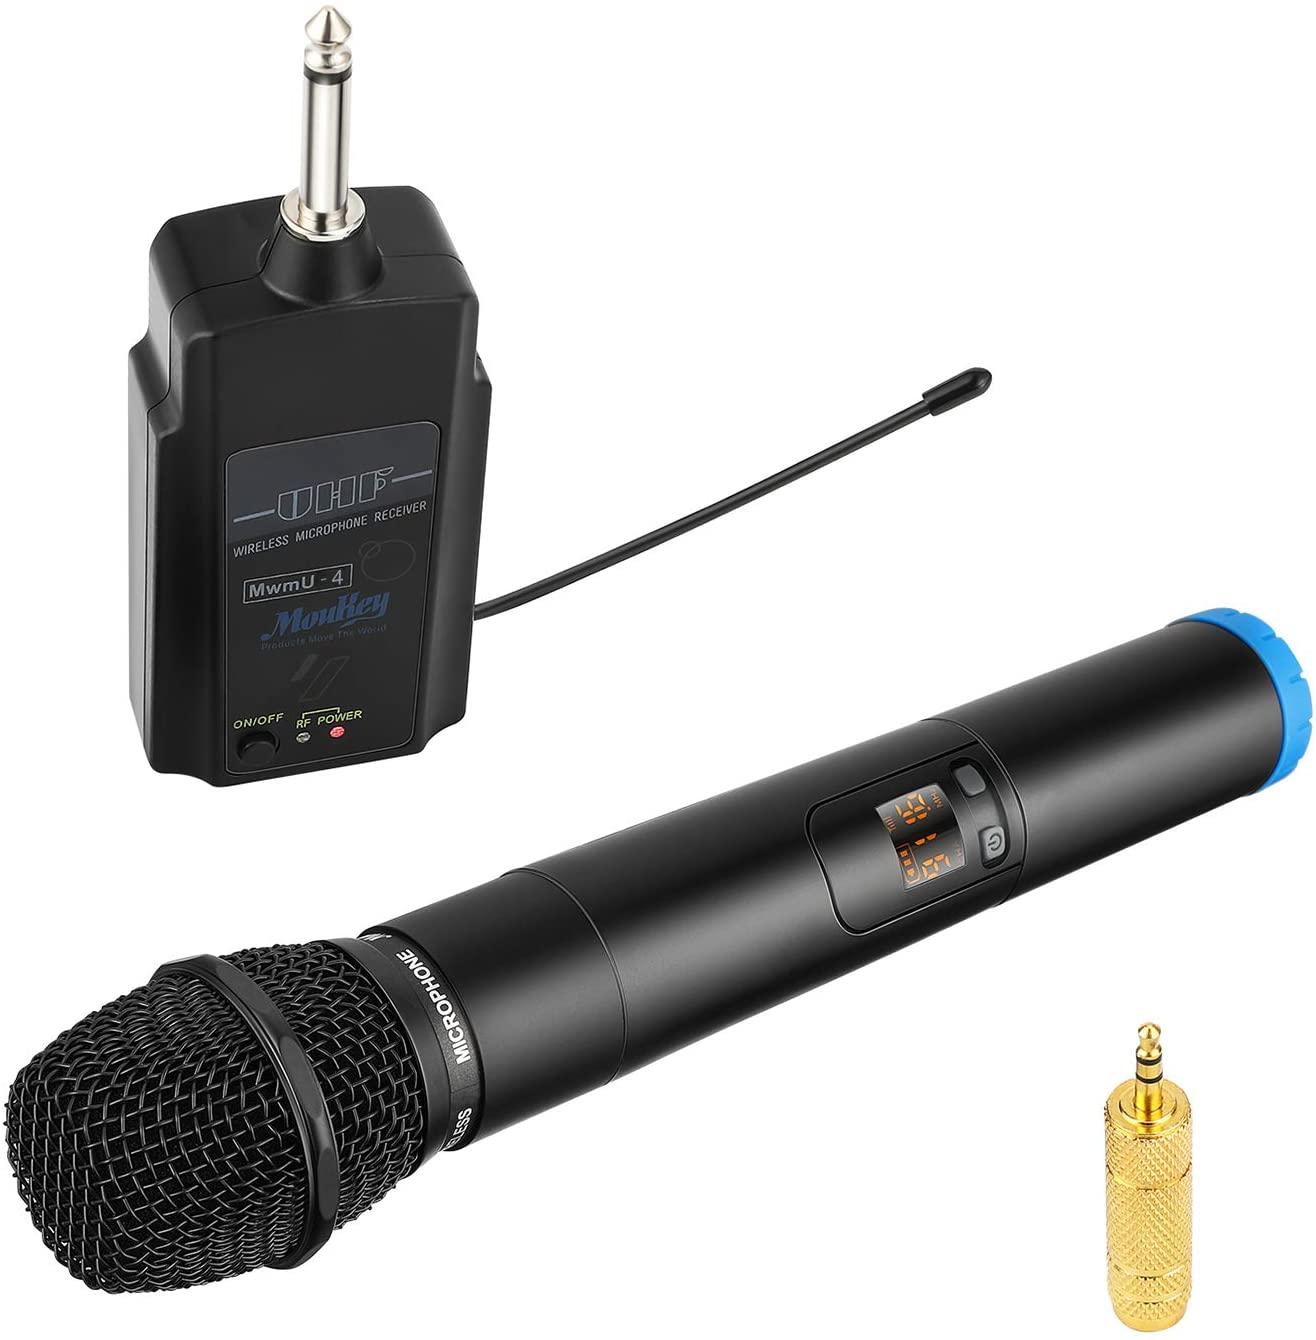 Moukey Wireless Microphone, UHF Dynamic Handheld Karaoke Mic Wireless Mic System for Karaoke, Singing, Stage, Wedding, Speech, Karaoke Machine, Amplifier, Mixer,PA System,Speakers - 164ft